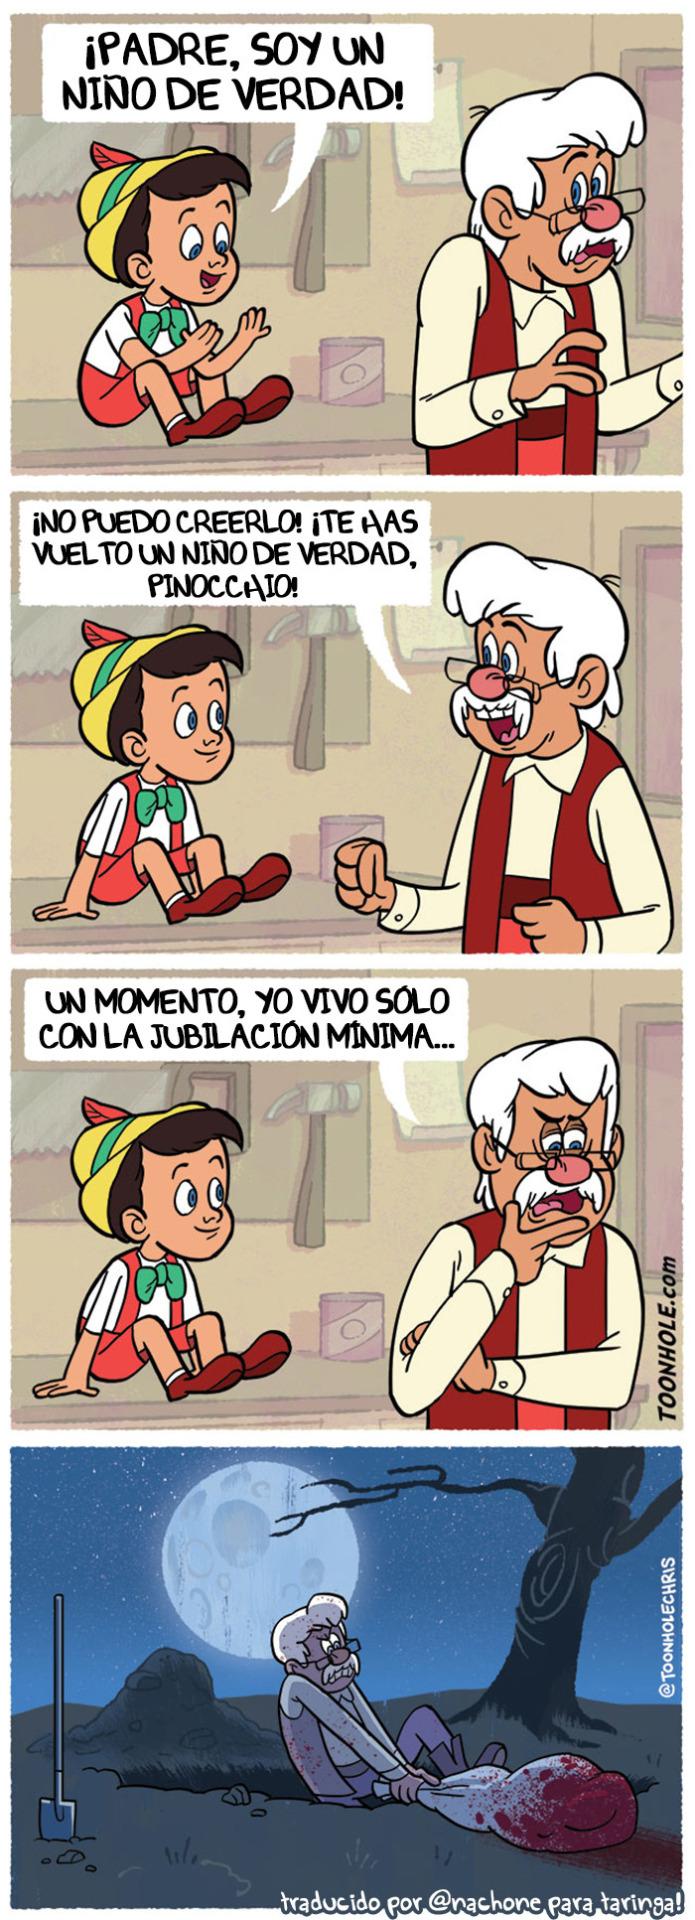 Pinocchio versión realista